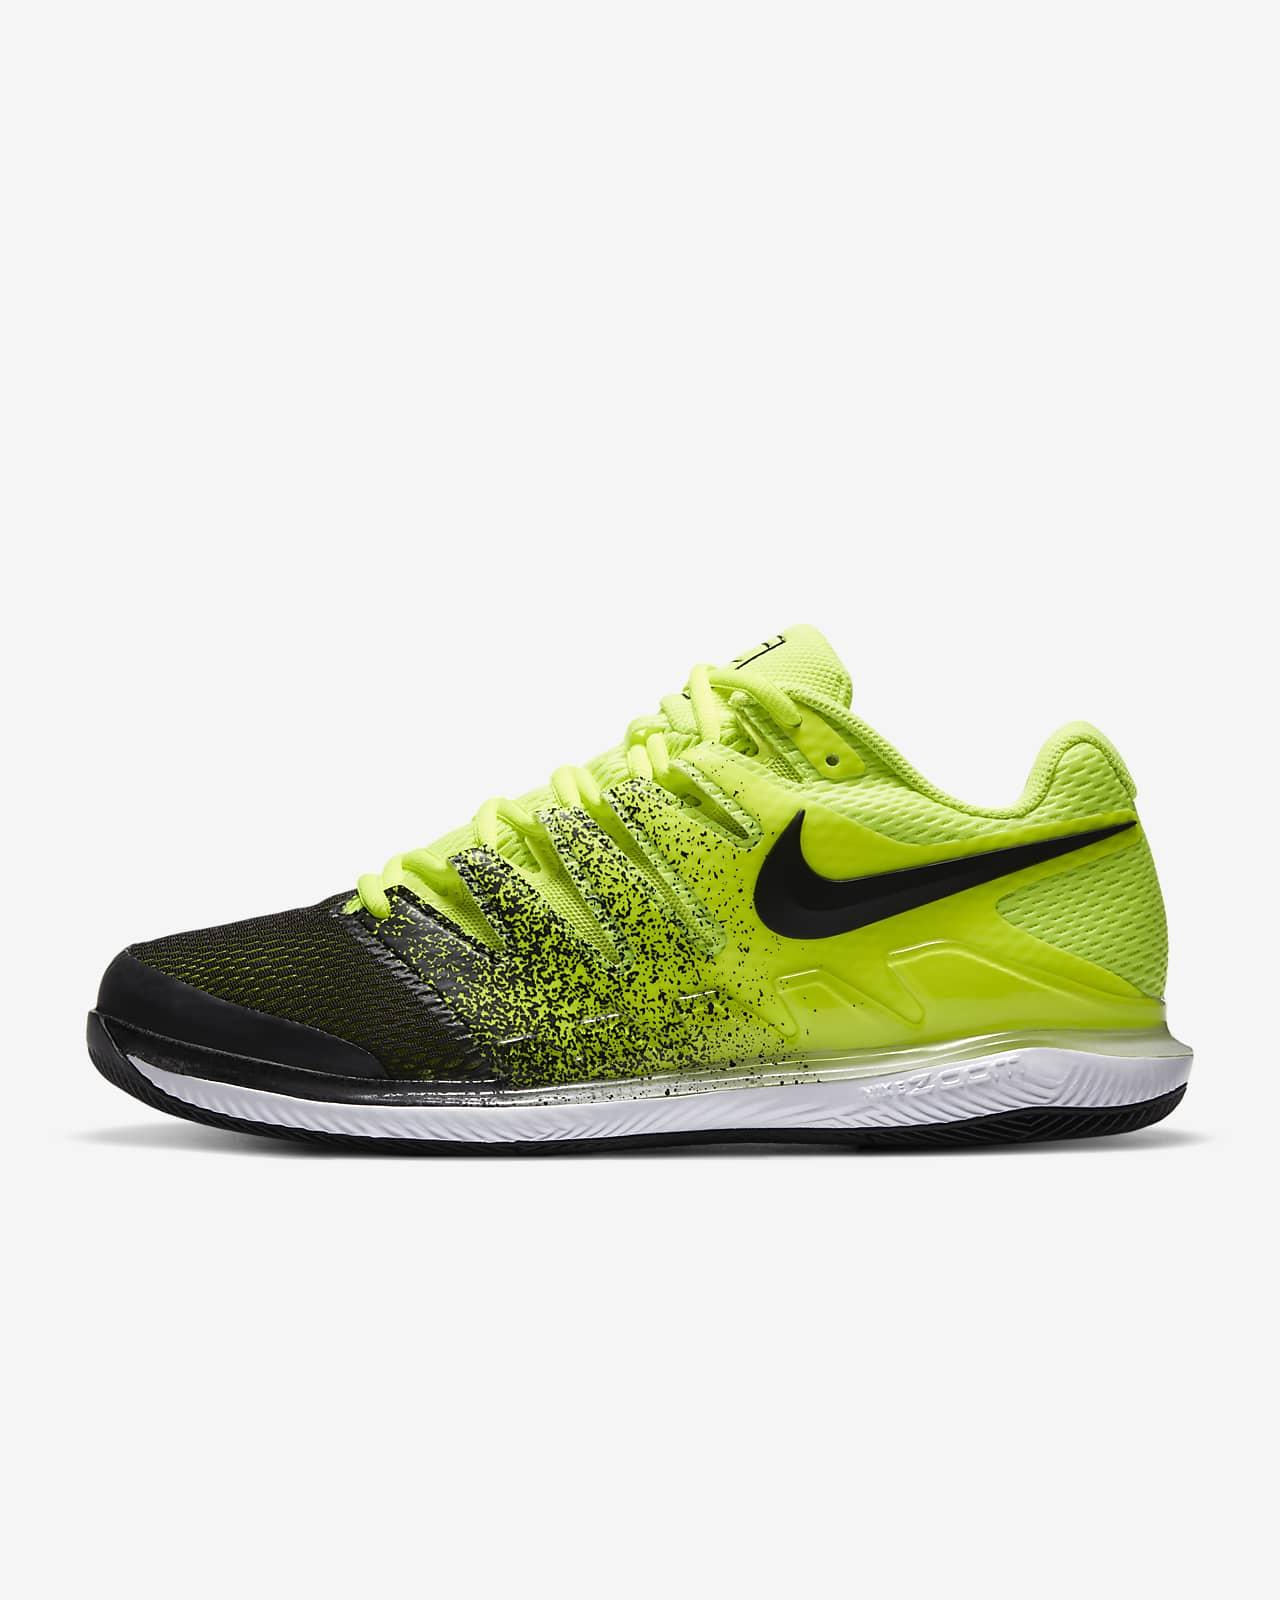 Nike Air Zoom Vapor X HC 男子硬地球场网球鞋